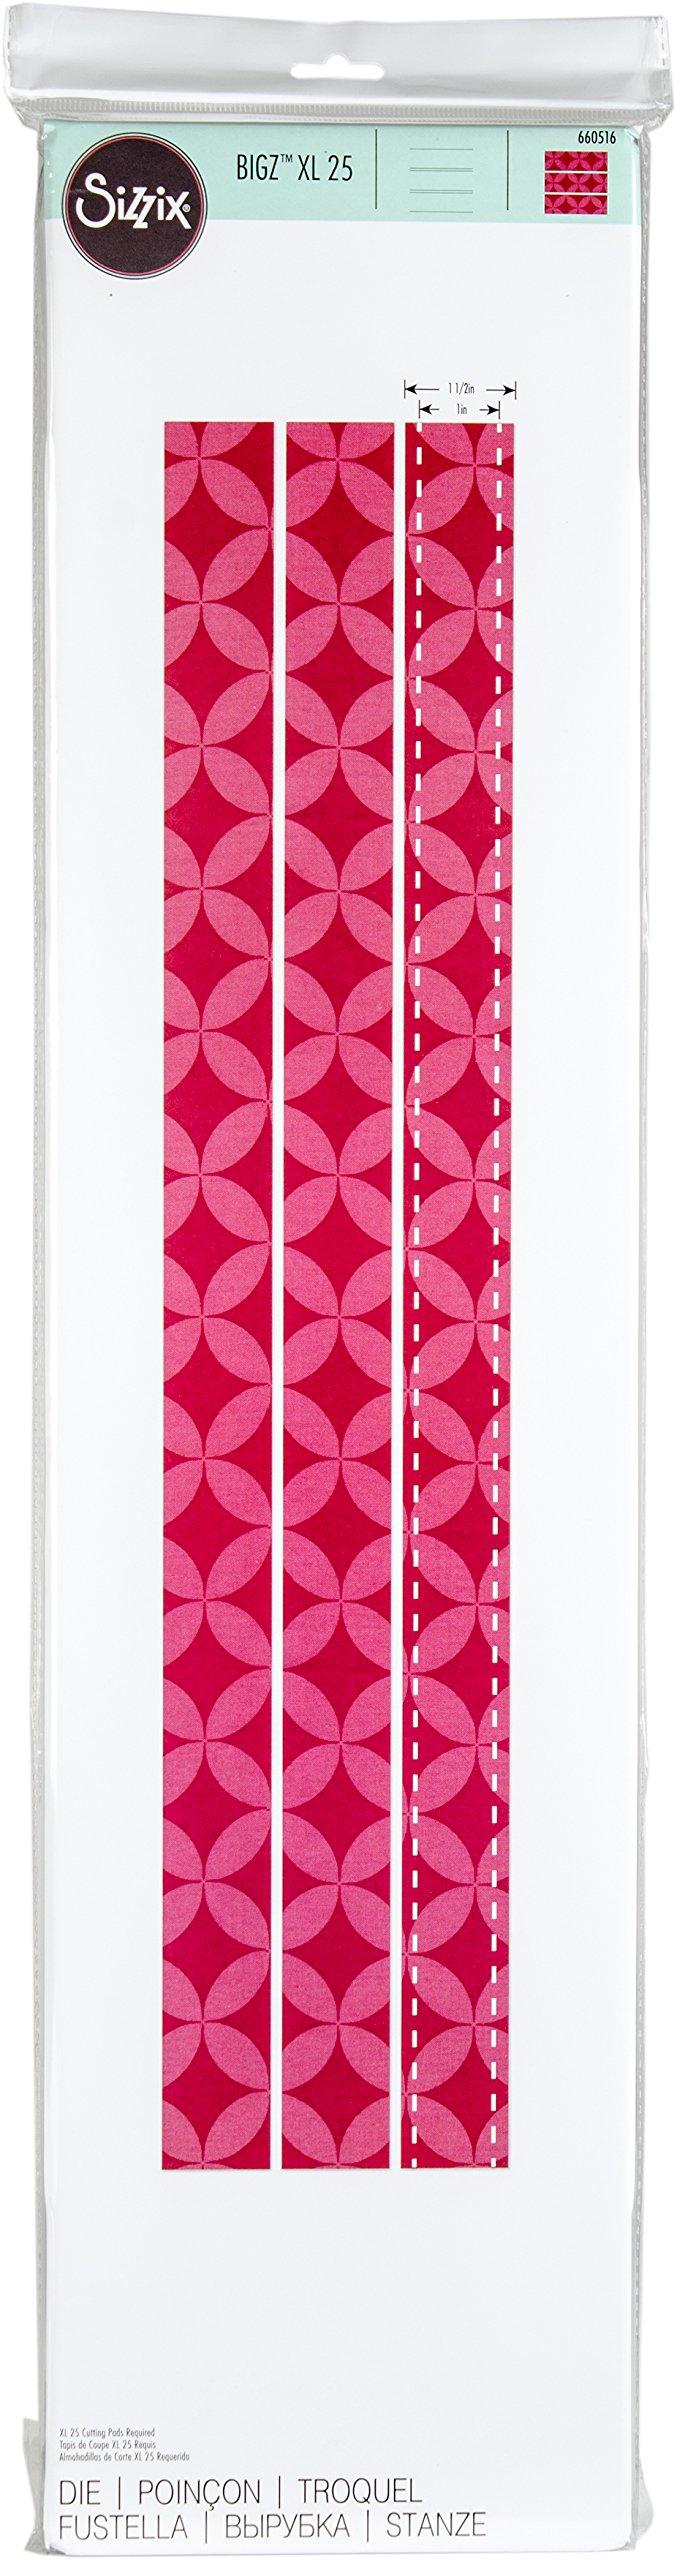 Sizzix 660516 Bigz Dies Fabi Edition XL Die Strips, Multicolor